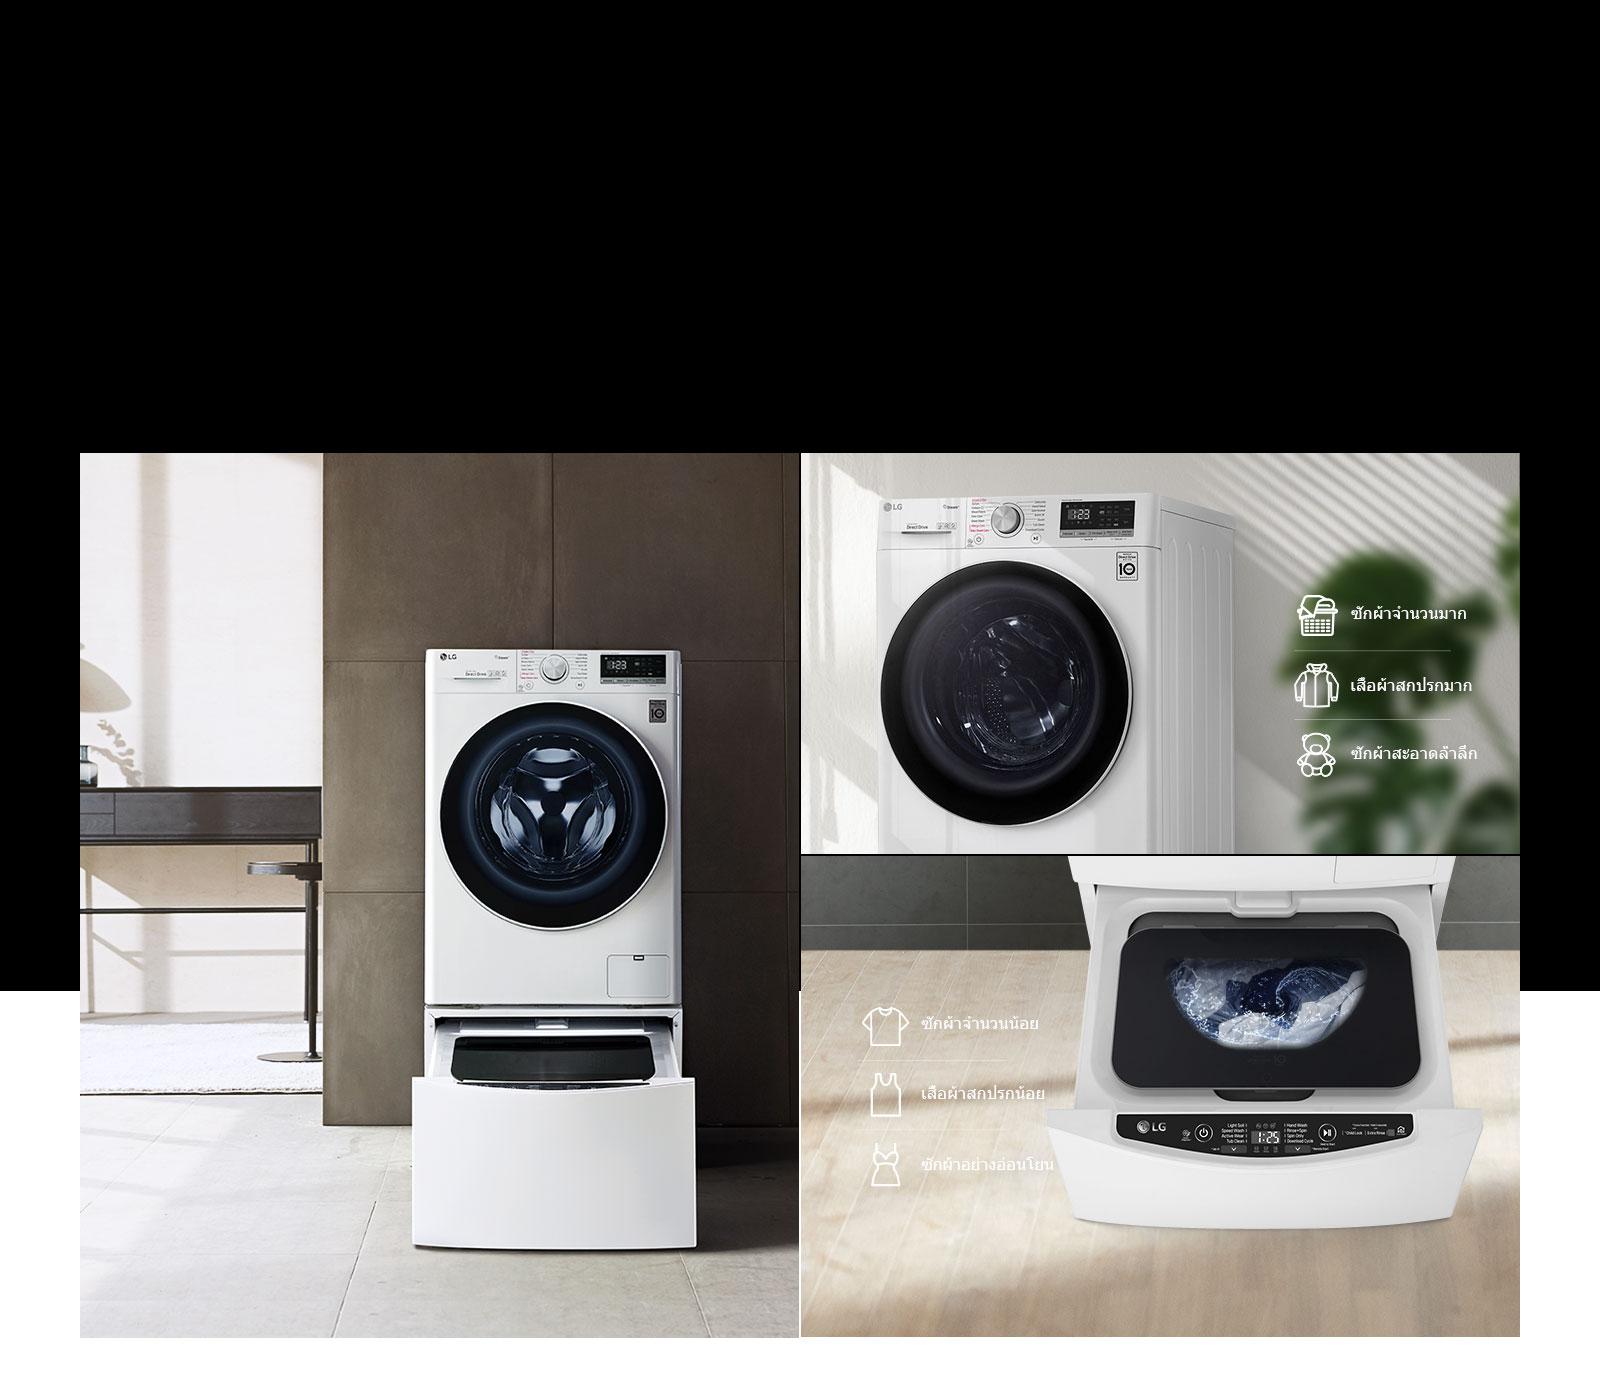 WM-Vivace-V500-VC4-White-08-1-Compatibility-Desktop-vv1